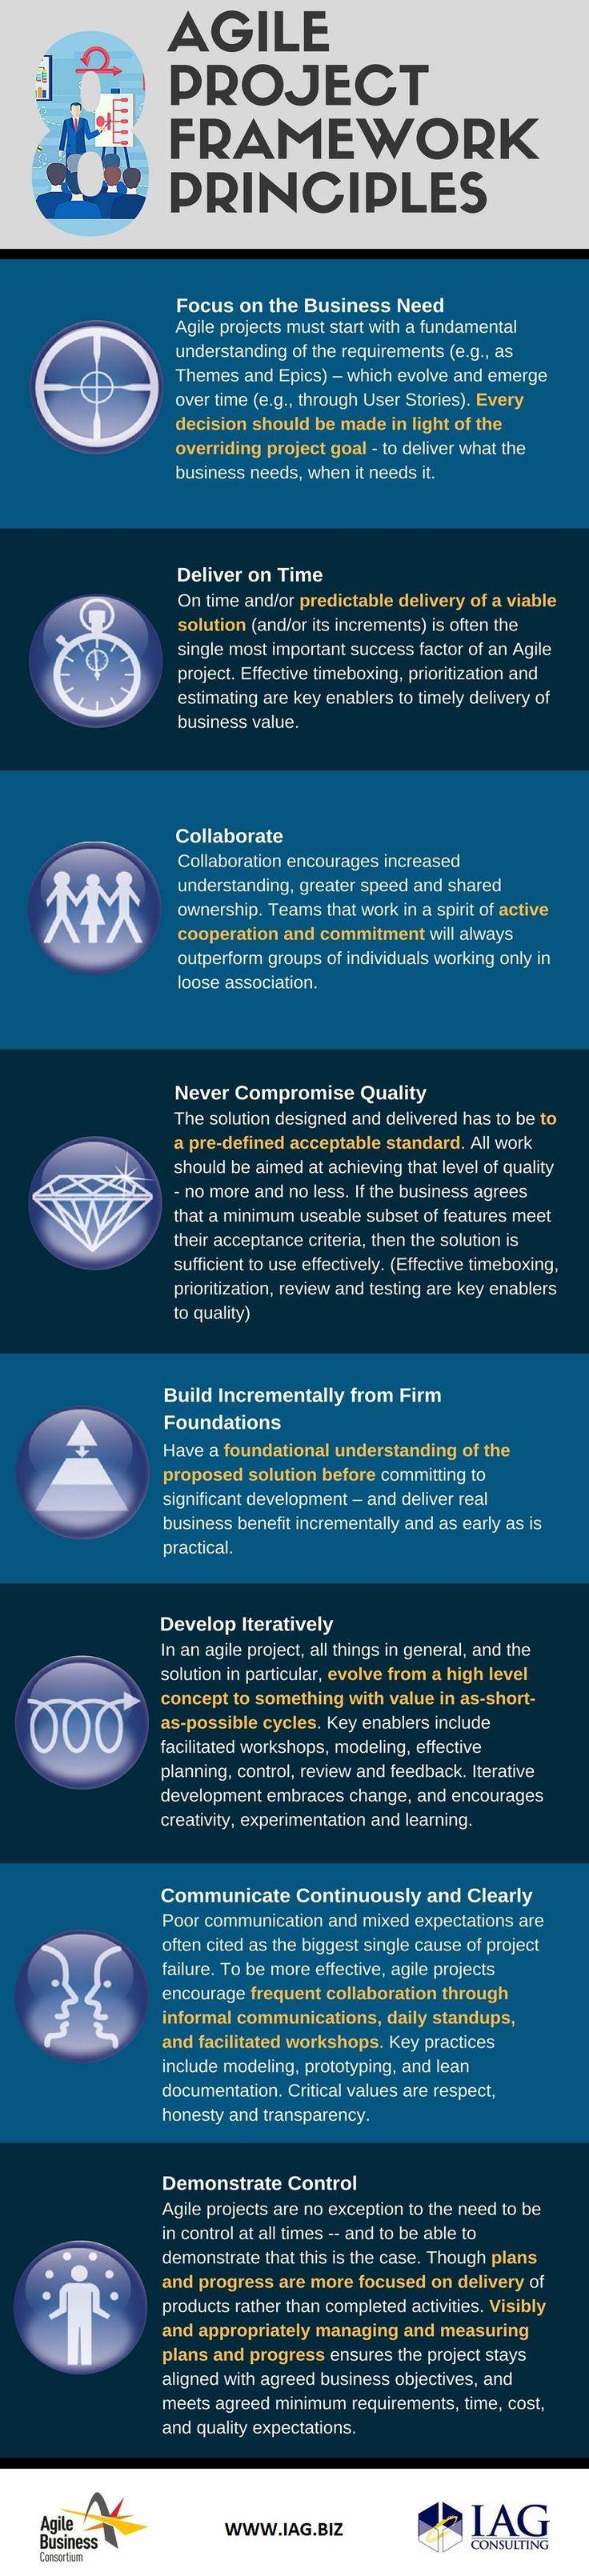 The Agile Business Consortiumu0027s 8 Principles of